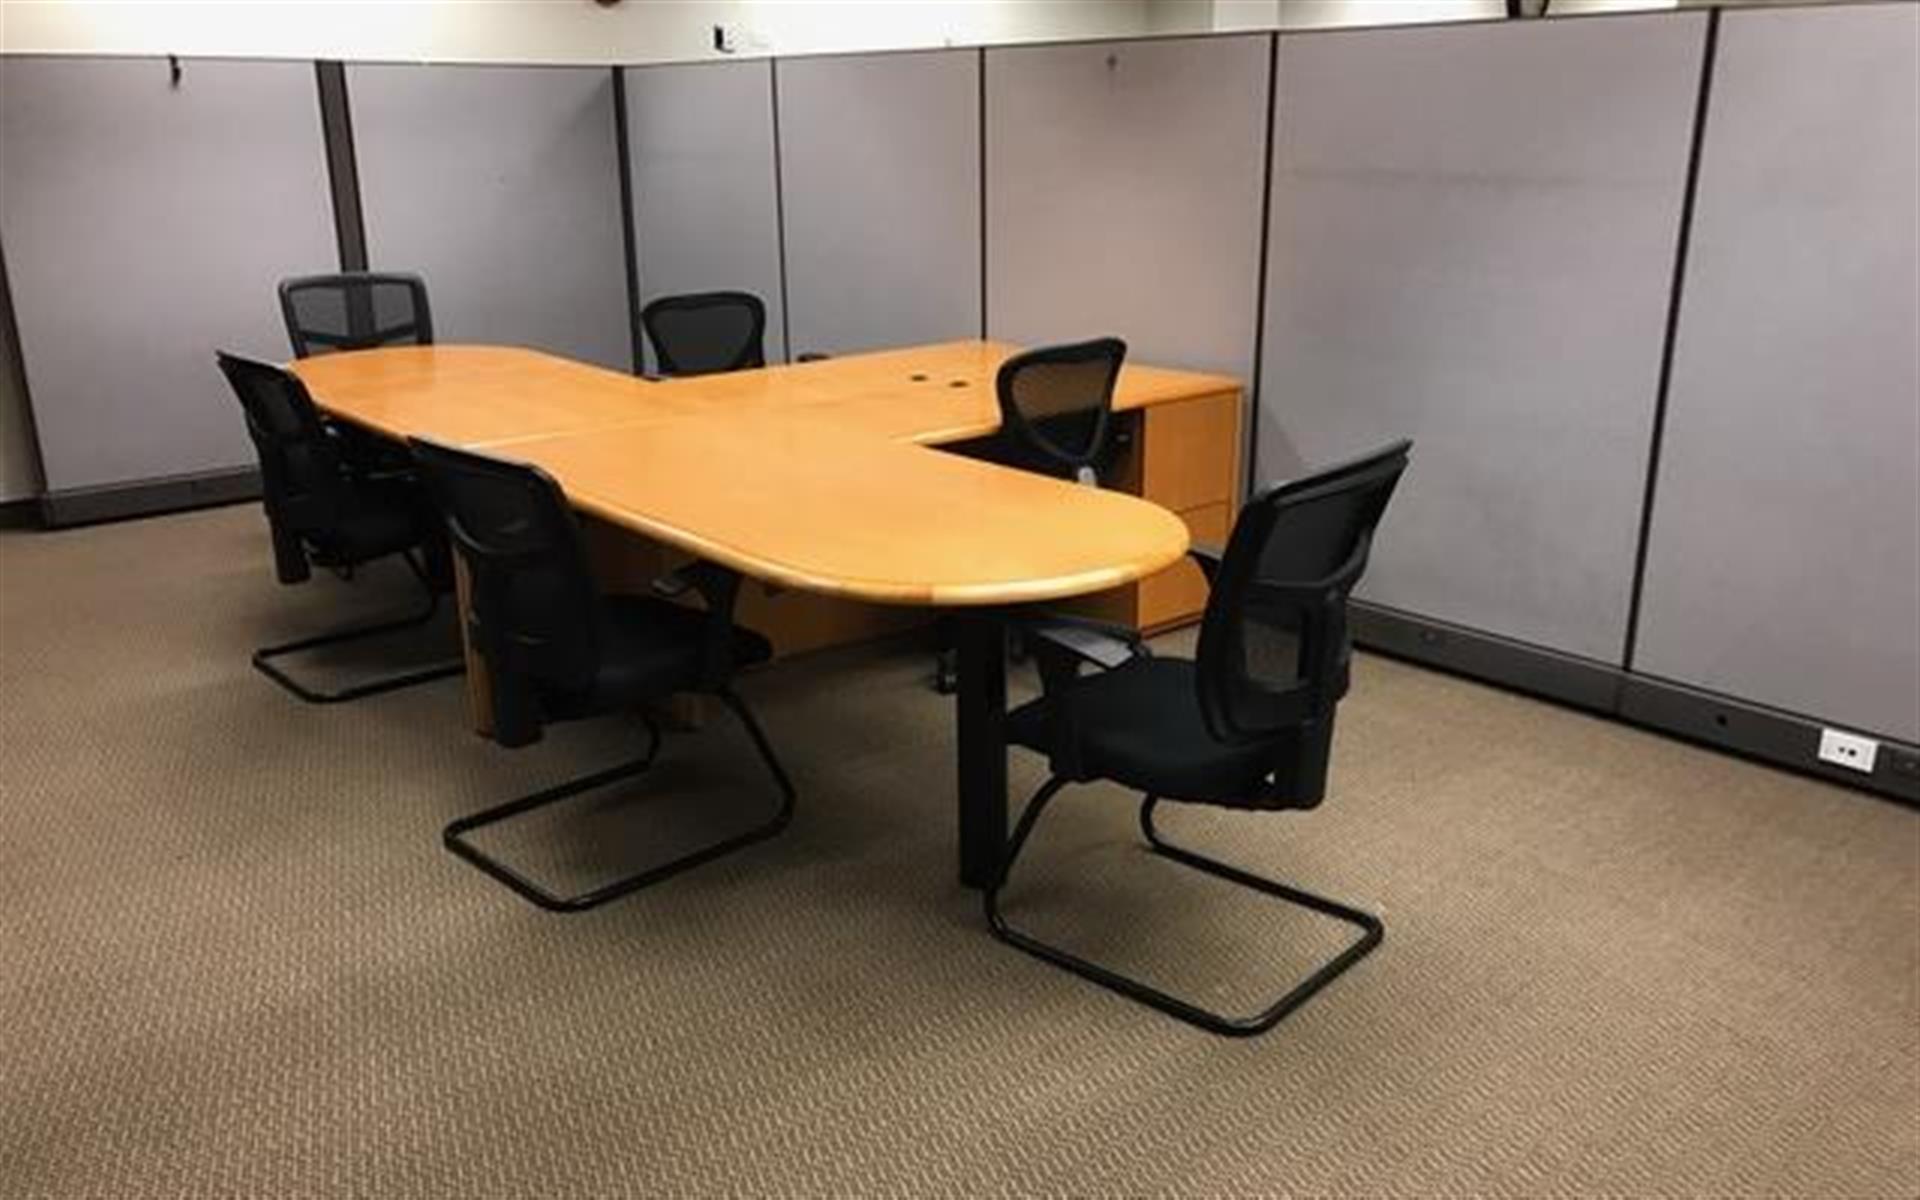 SUMPURA Analytics-Chicagoland office - 4-person team space near Oak Brook